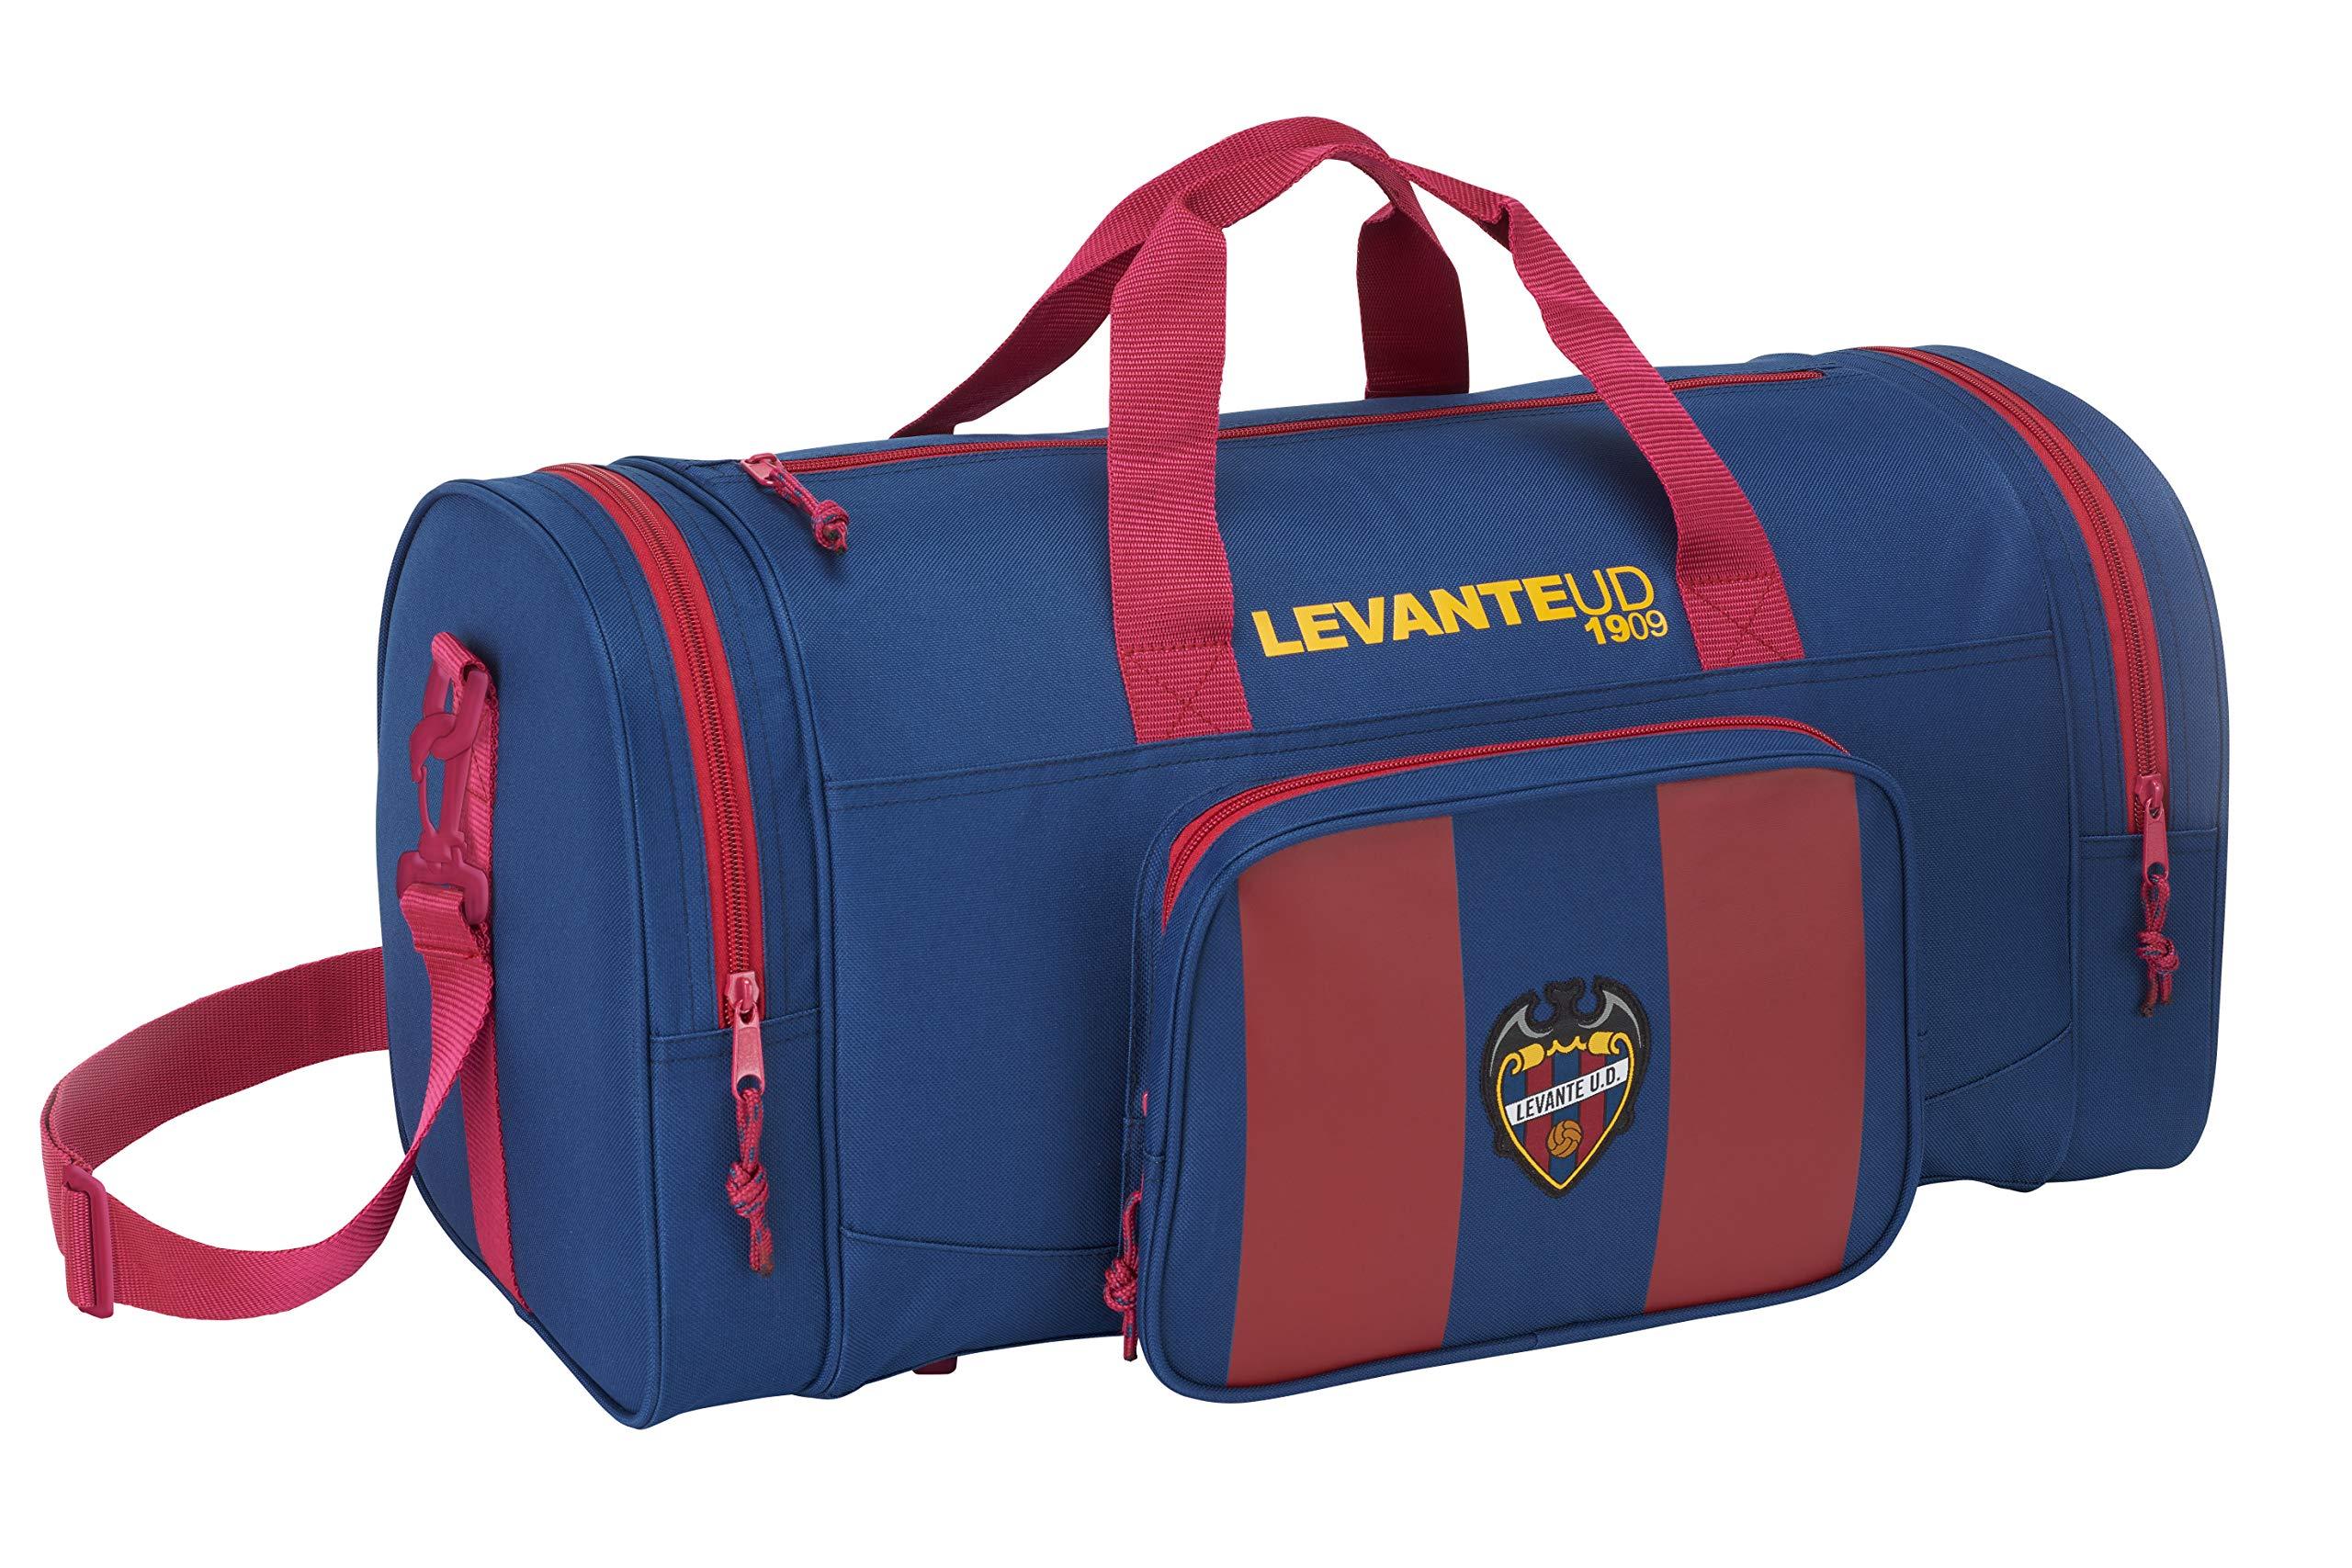 Levante U.D. 官方运动包